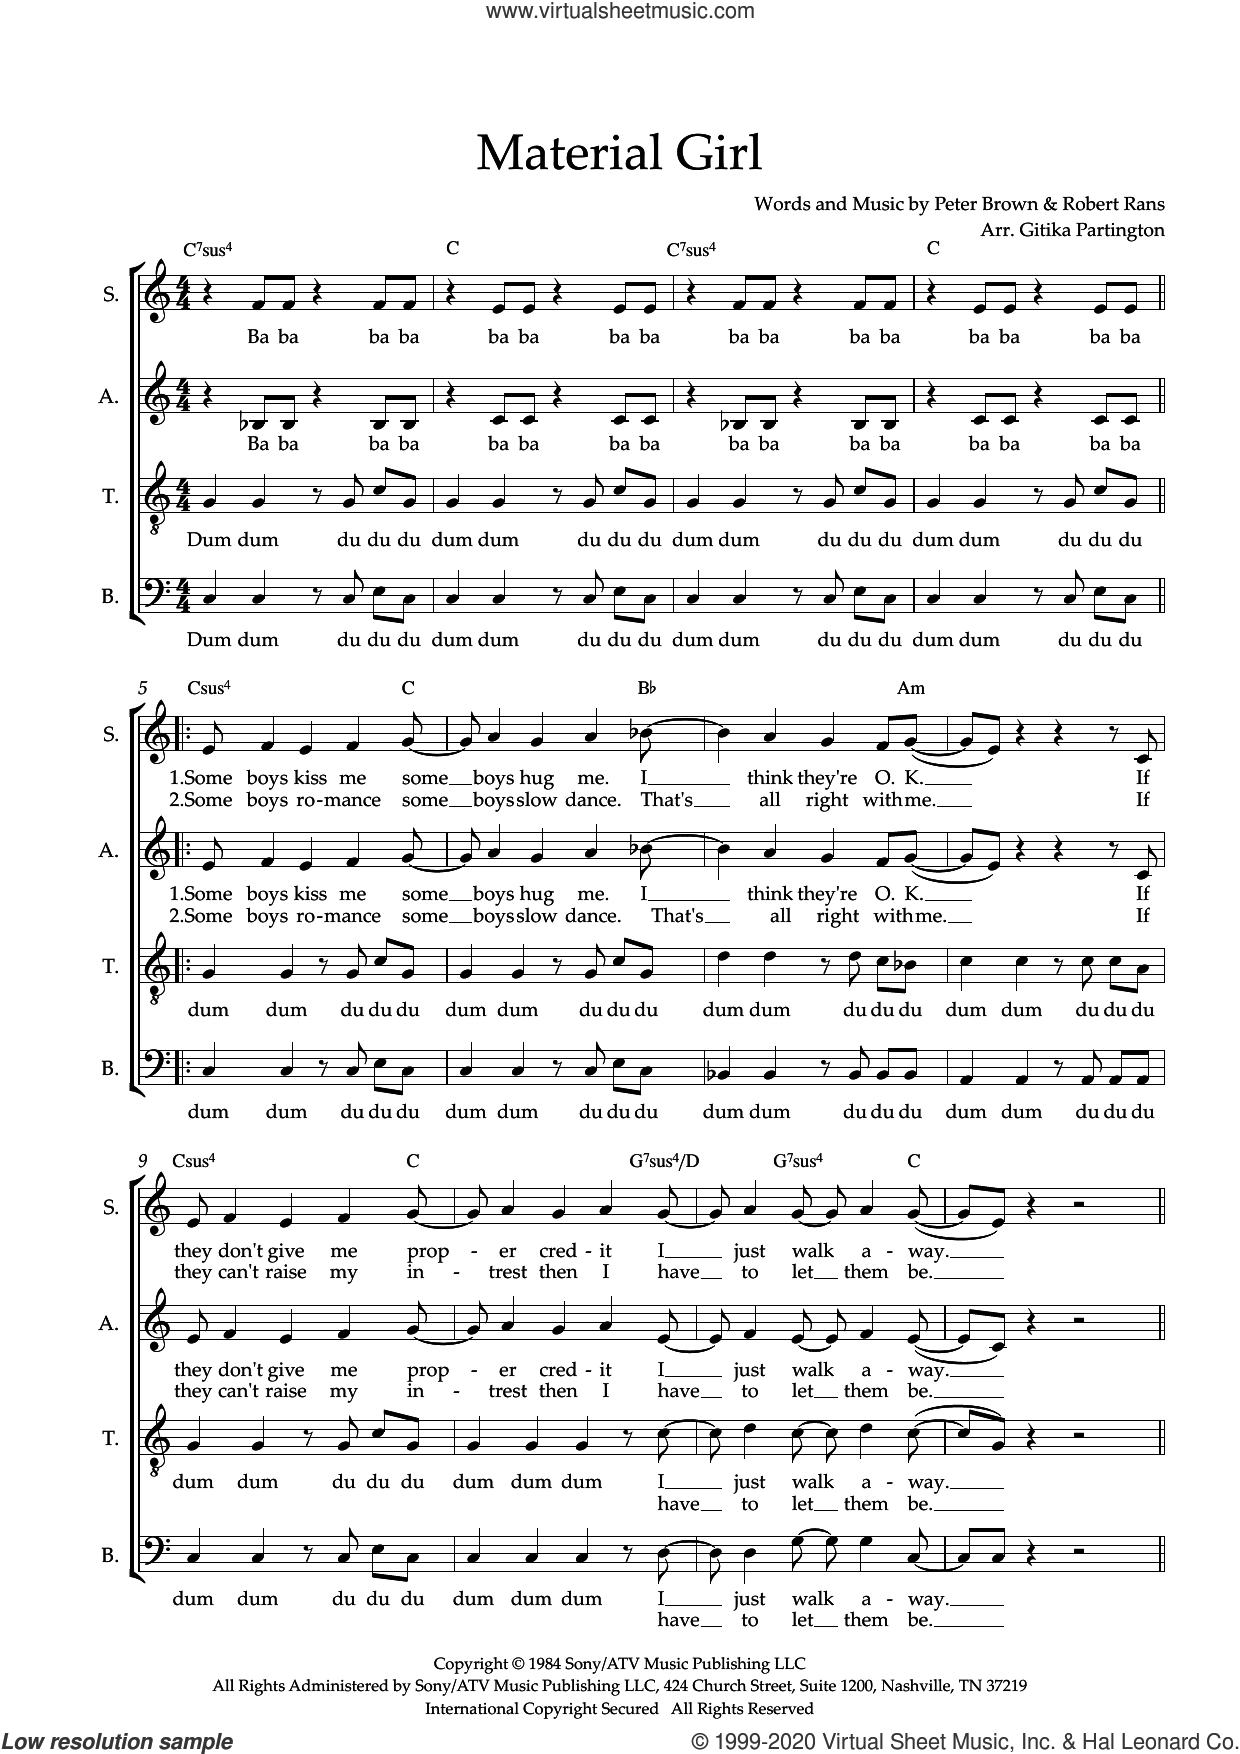 Material Girl (arr. Gitika Partington) sheet music for choir (SATB: soprano, alto, tenor, bass) by Madonna, Gitika Partington, Pete Brown and Robert Rans, intermediate skill level